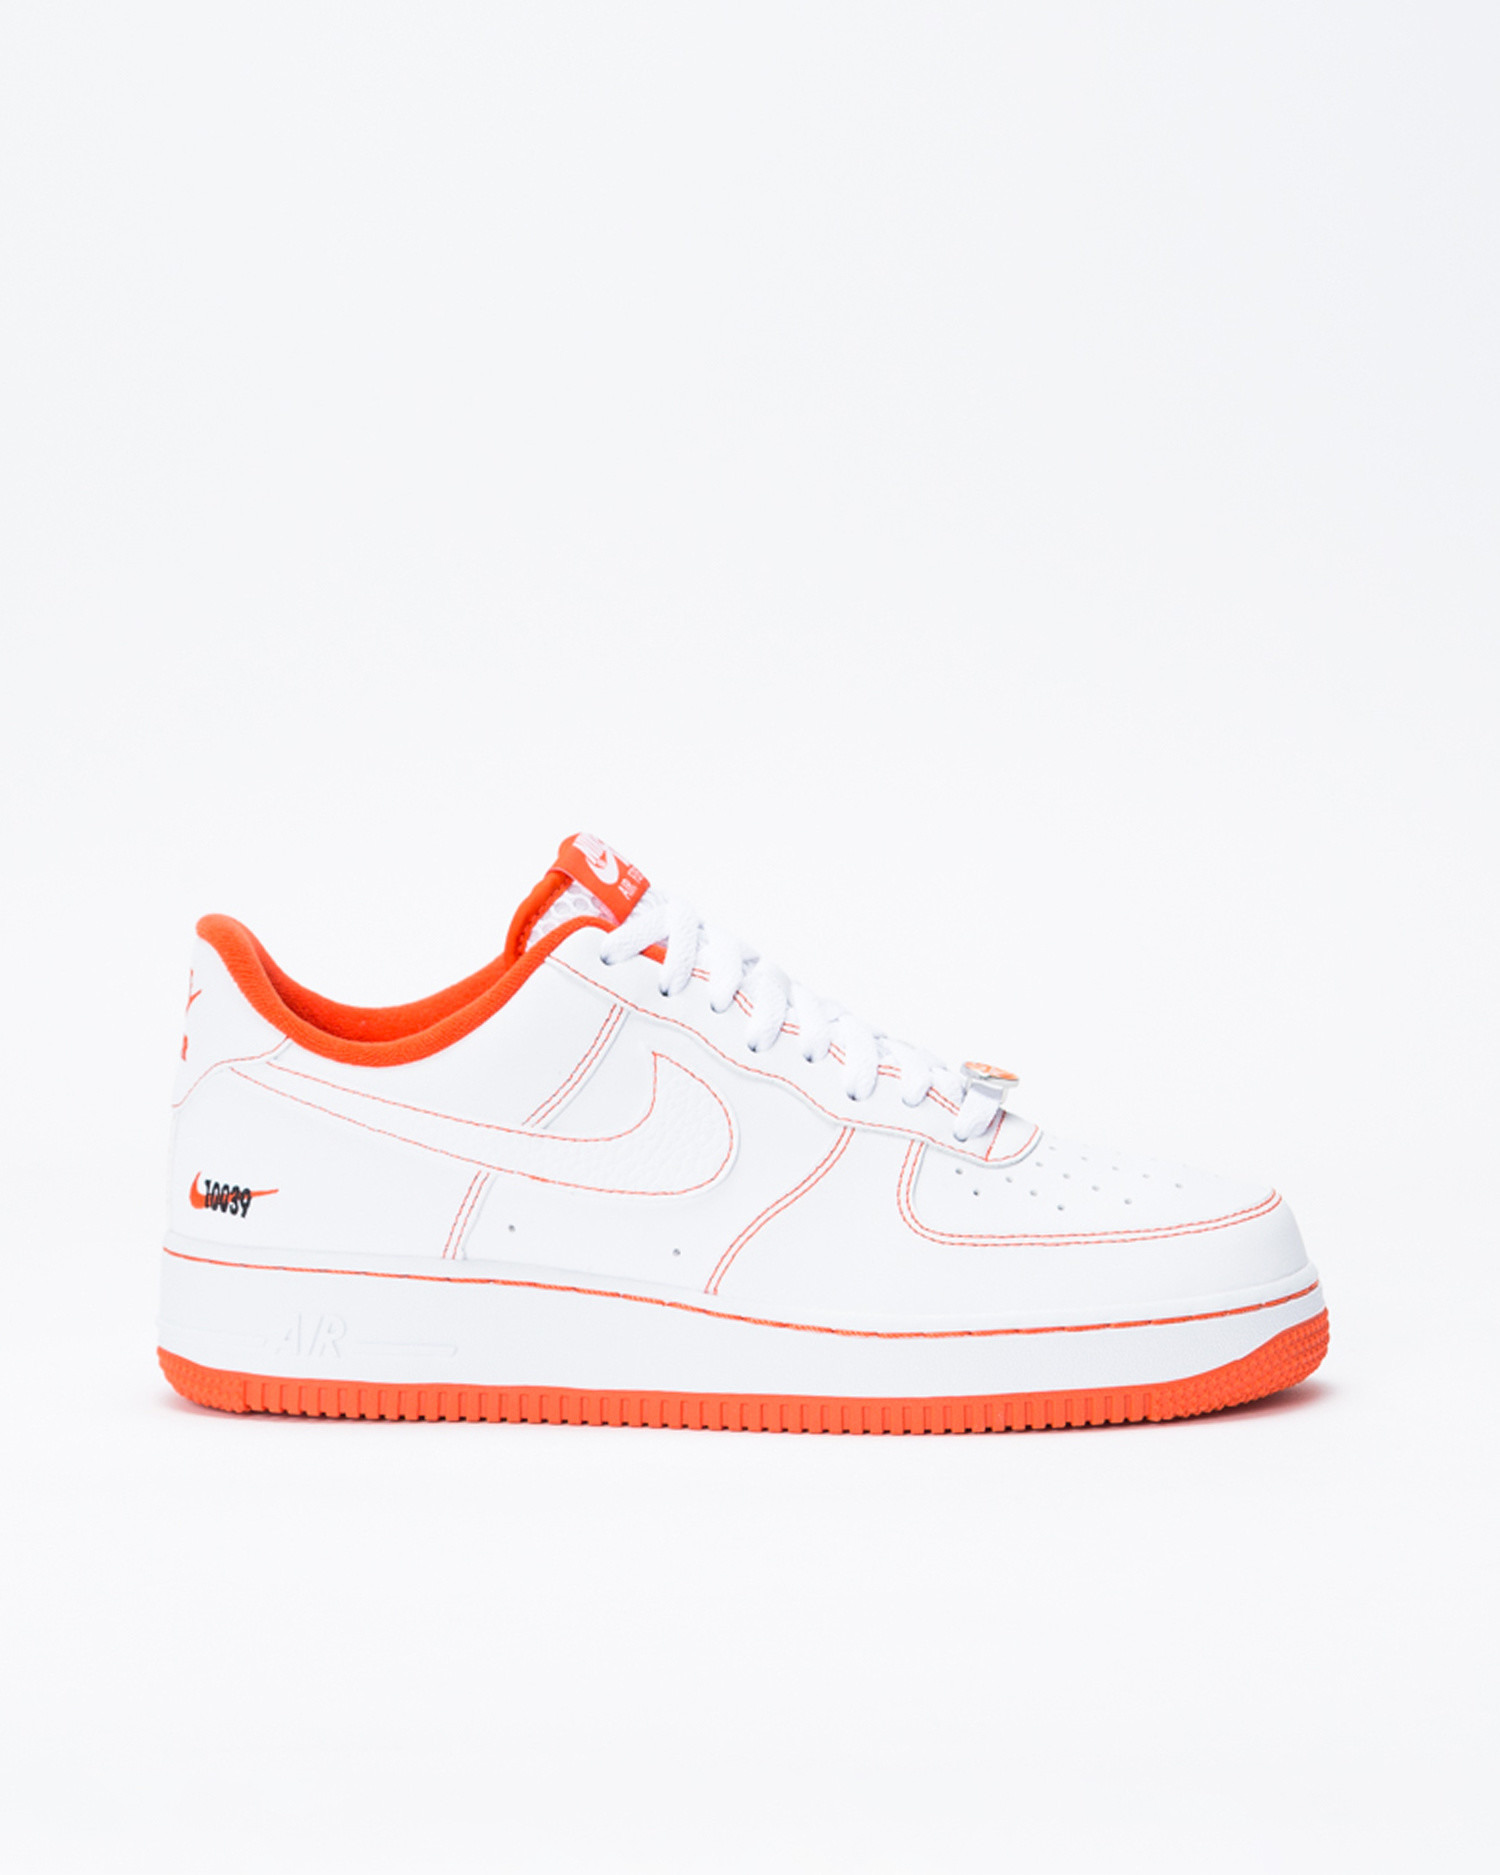 Nike Air Force 1'07 LV8 EMB White/Team Orange-Black